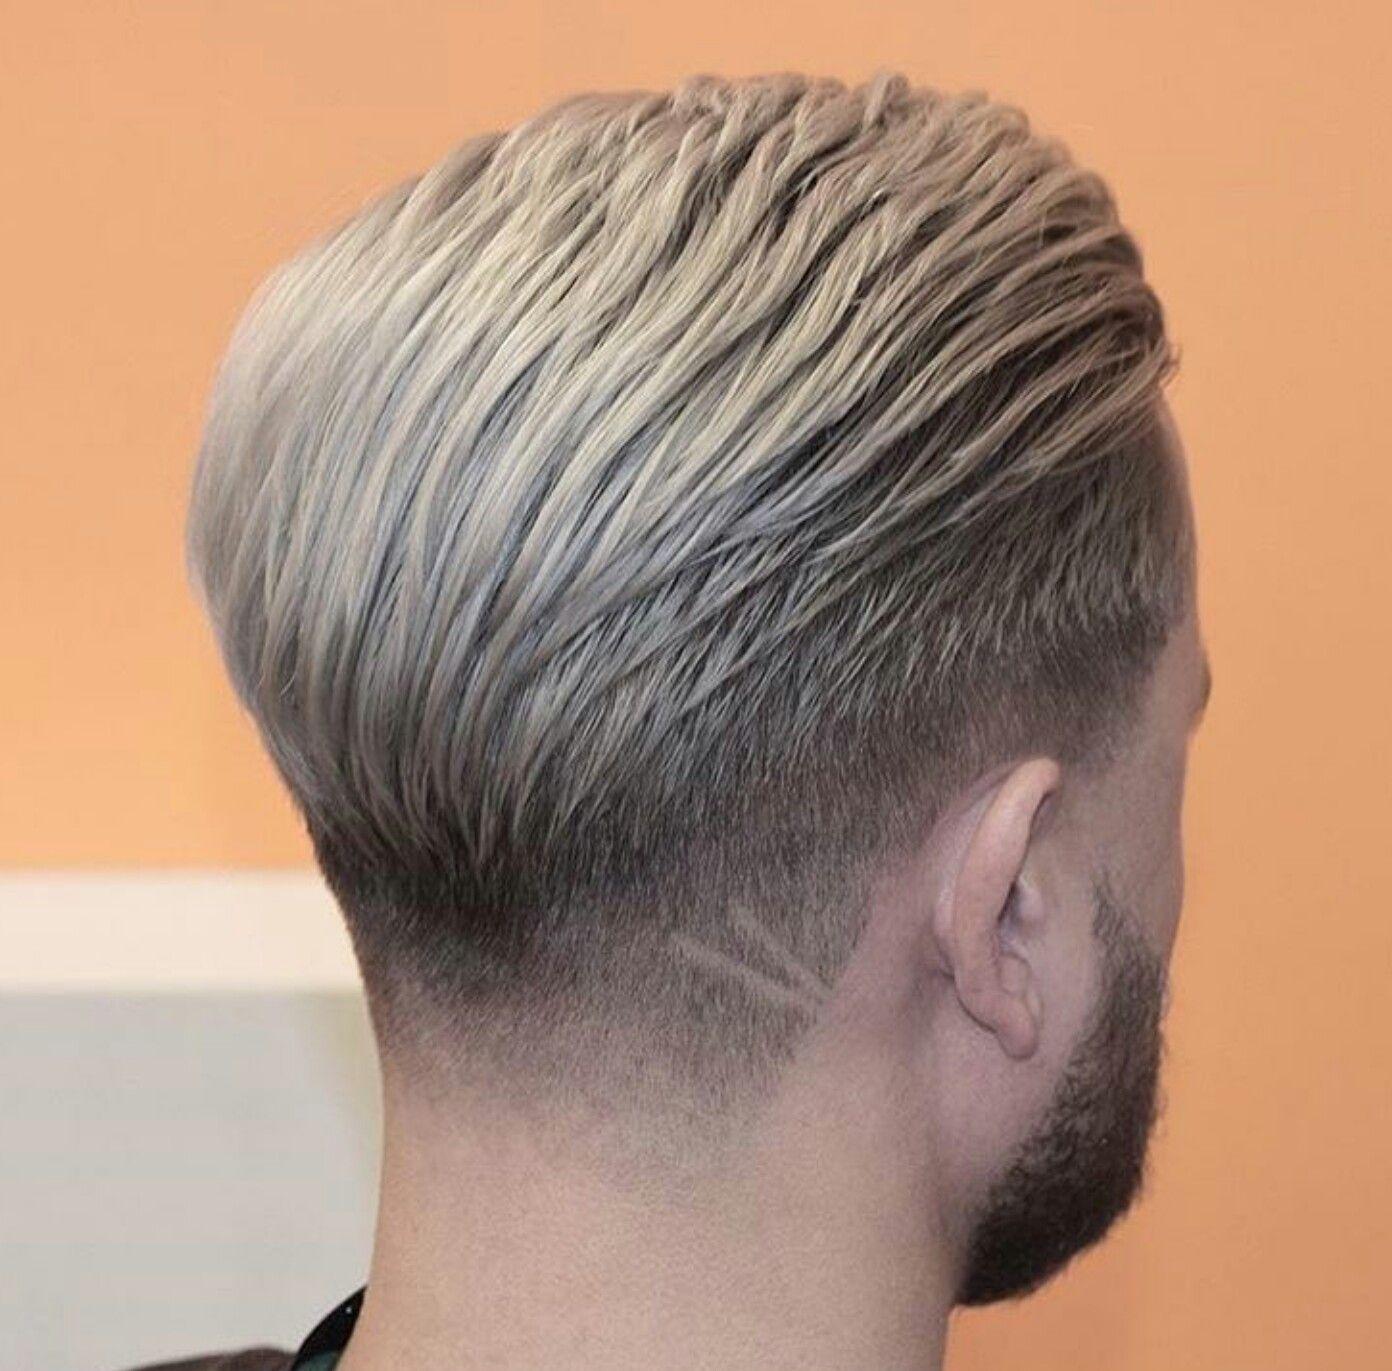 Low skin fade haircut men pin by armin l hoempler on menus hair  pinterest  hair styles